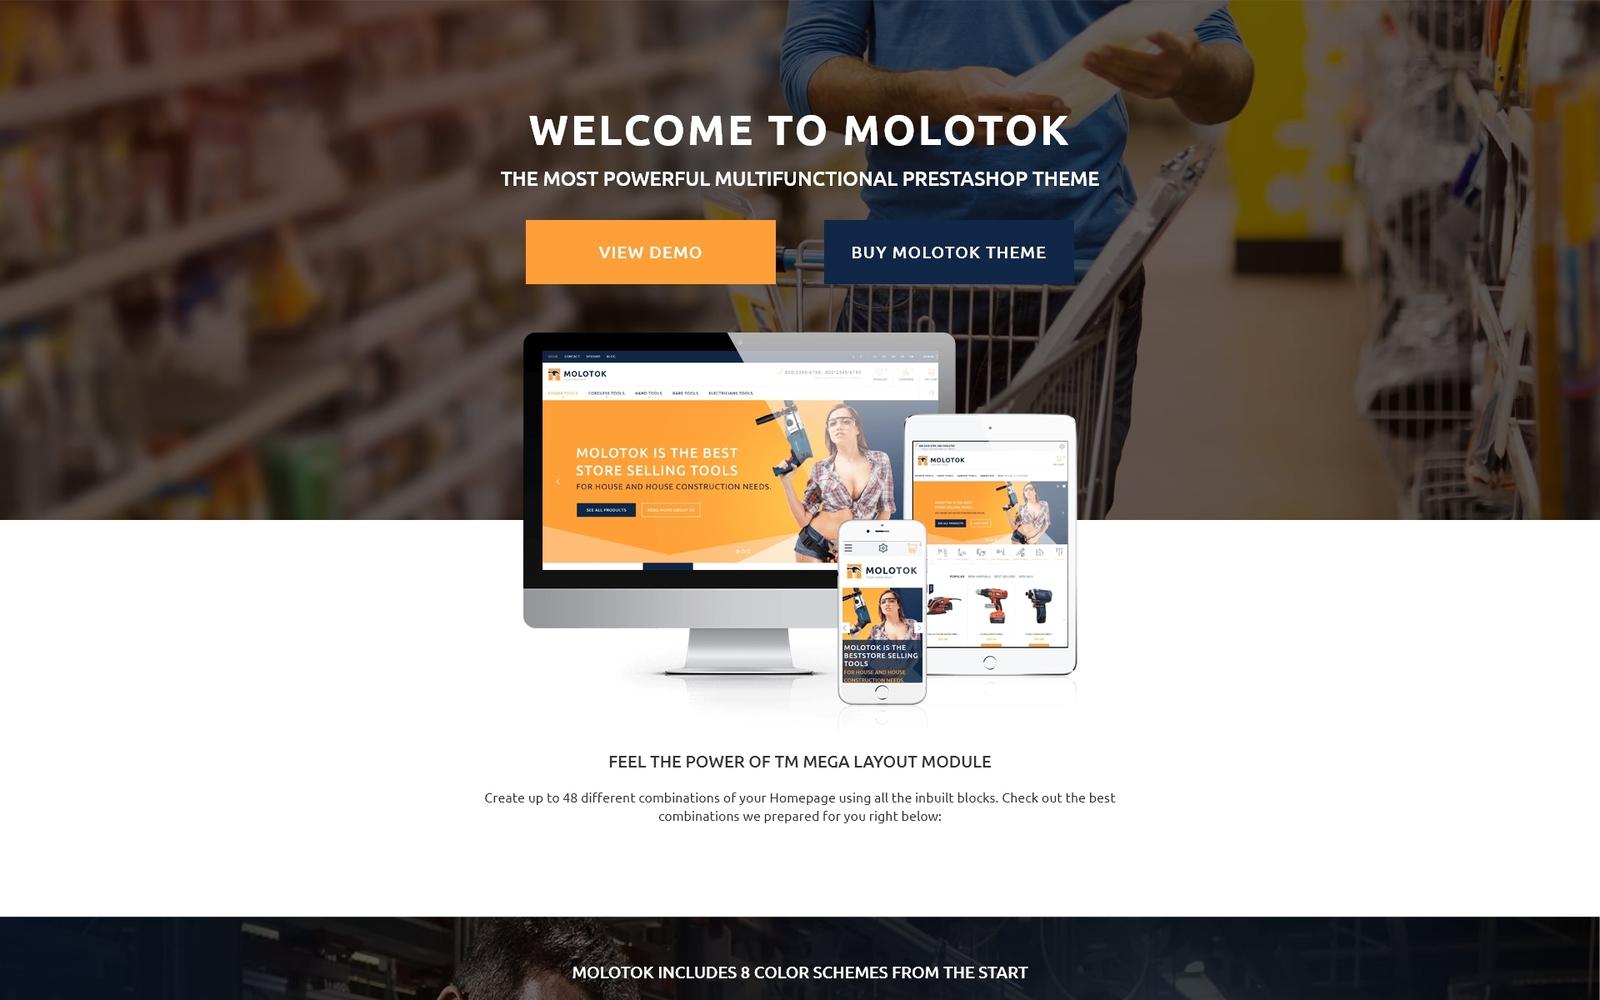 """Molotok - Hardware Tools eCommerce Template"" 响应式PrestaShop模板 #58148"